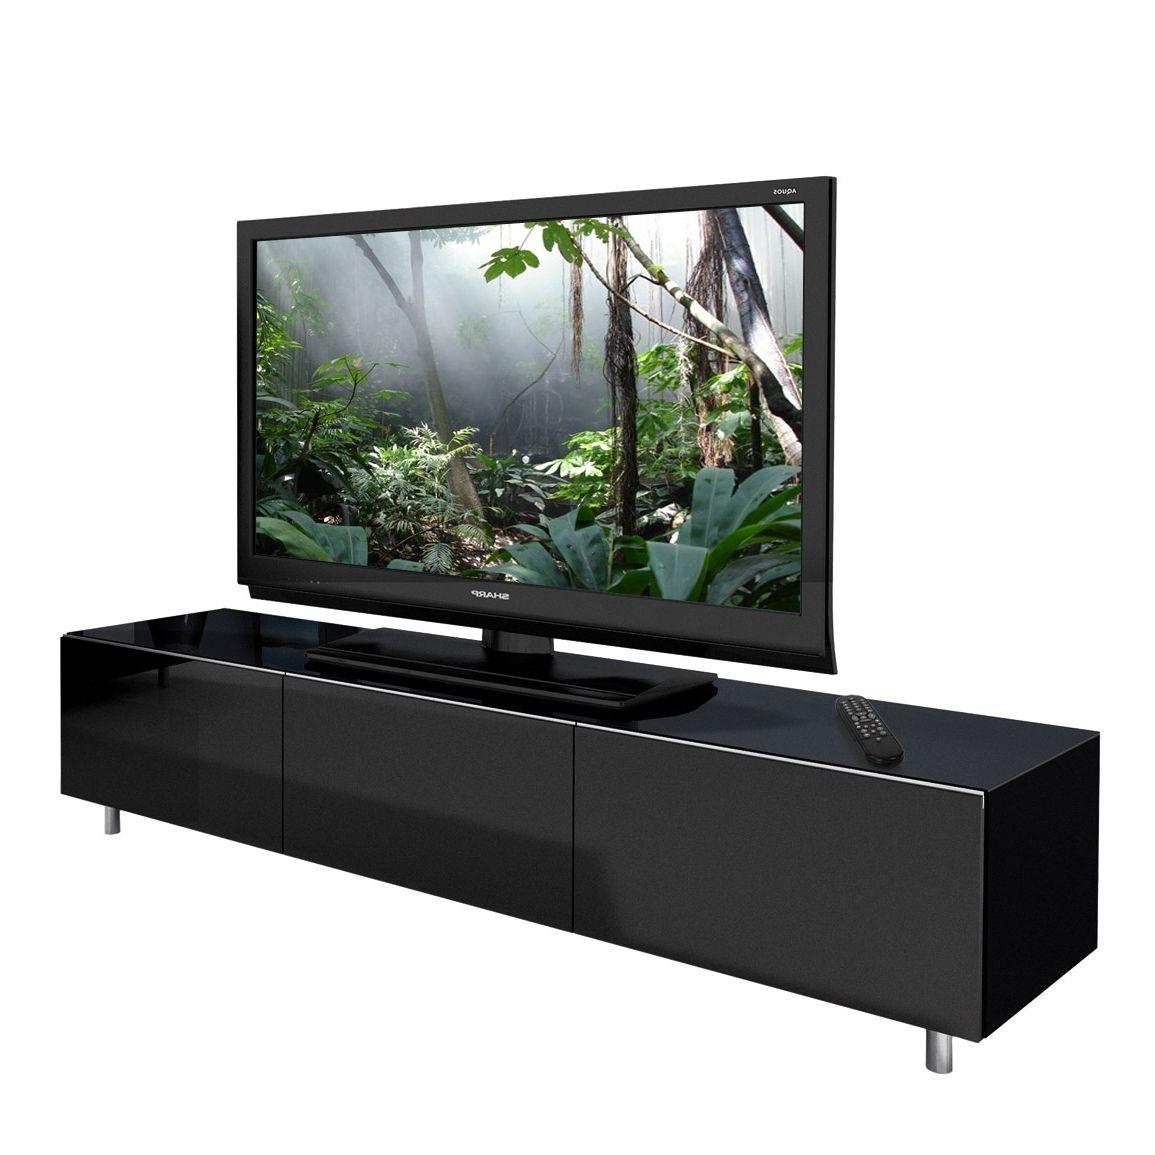 Long Black Gloss Tv Unit | Tv stand wood, Tv stand, Black tv cabinet